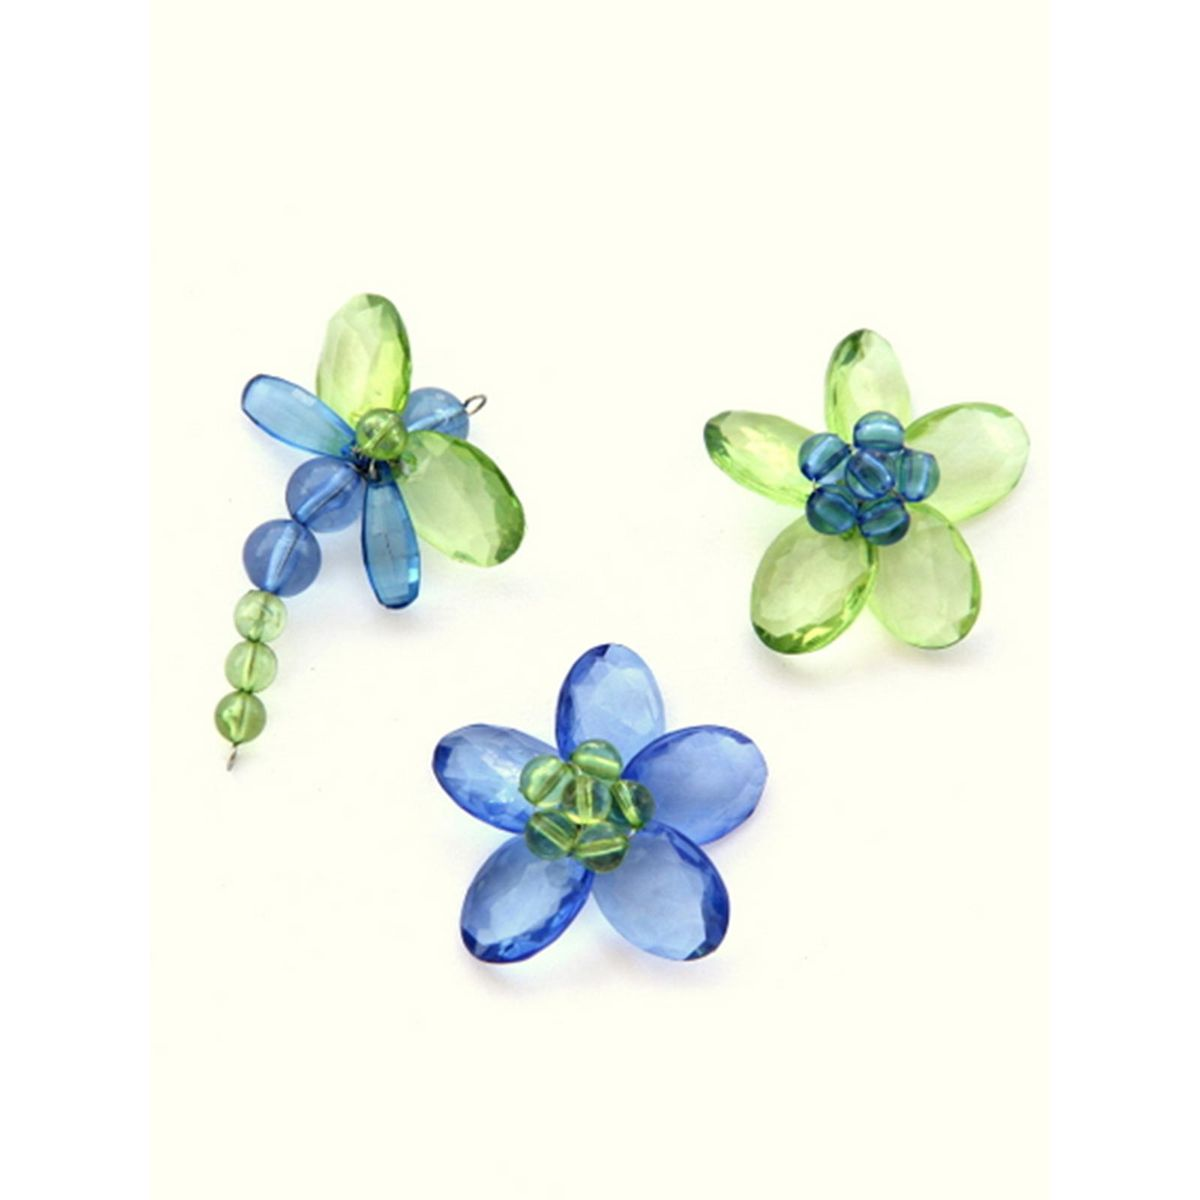 Quirky Fridge Magnets- Garden Blue